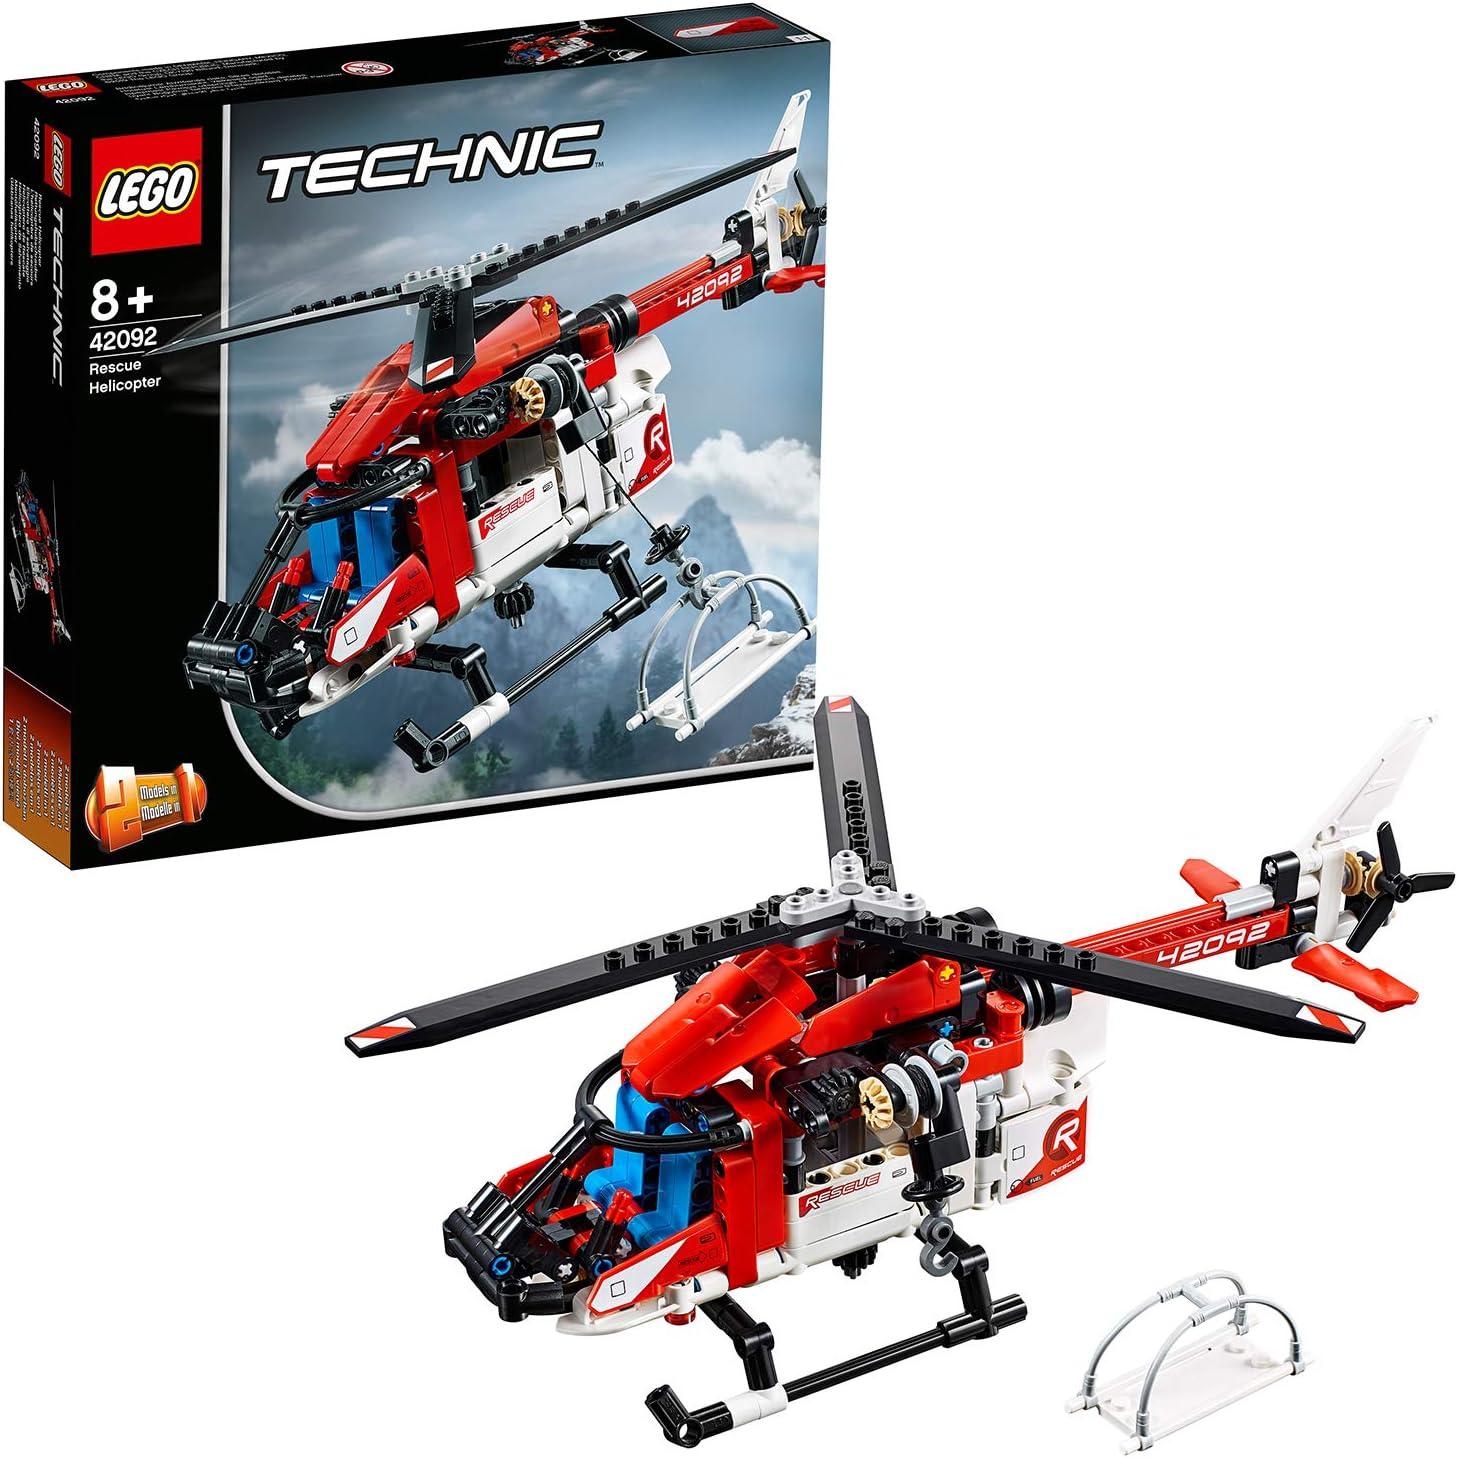 LEGO Technic - Helicóptero de Rescate, maqueta de juguete ...